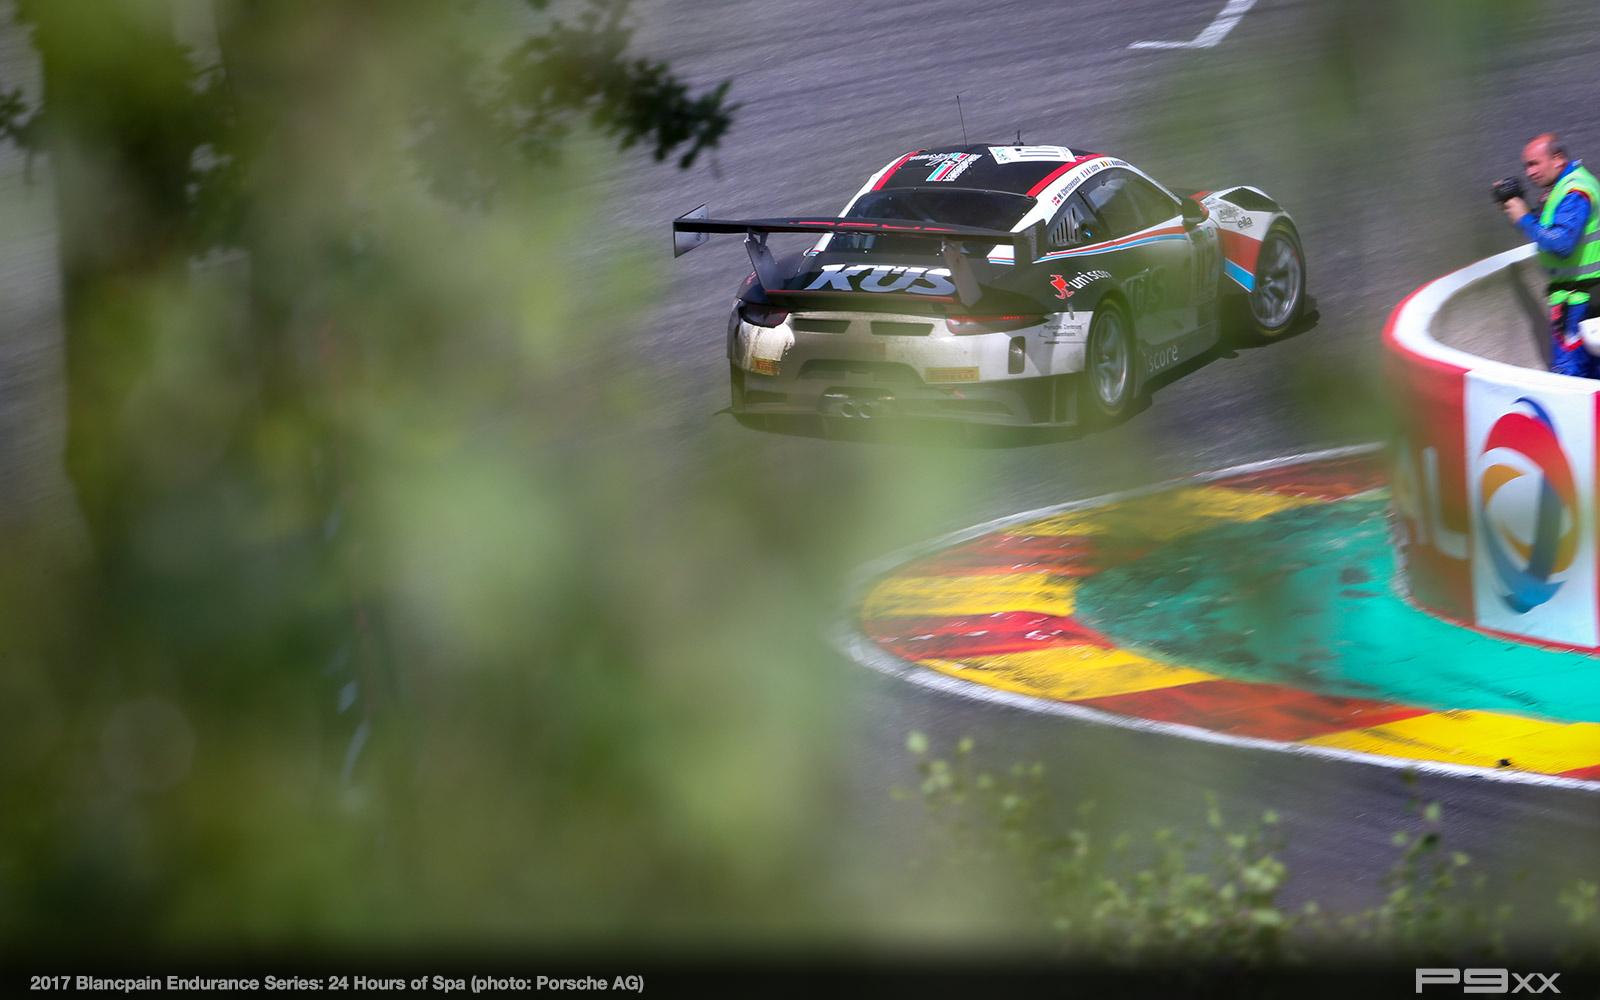 2017-24-Hours-of-Spa-Porsche-381